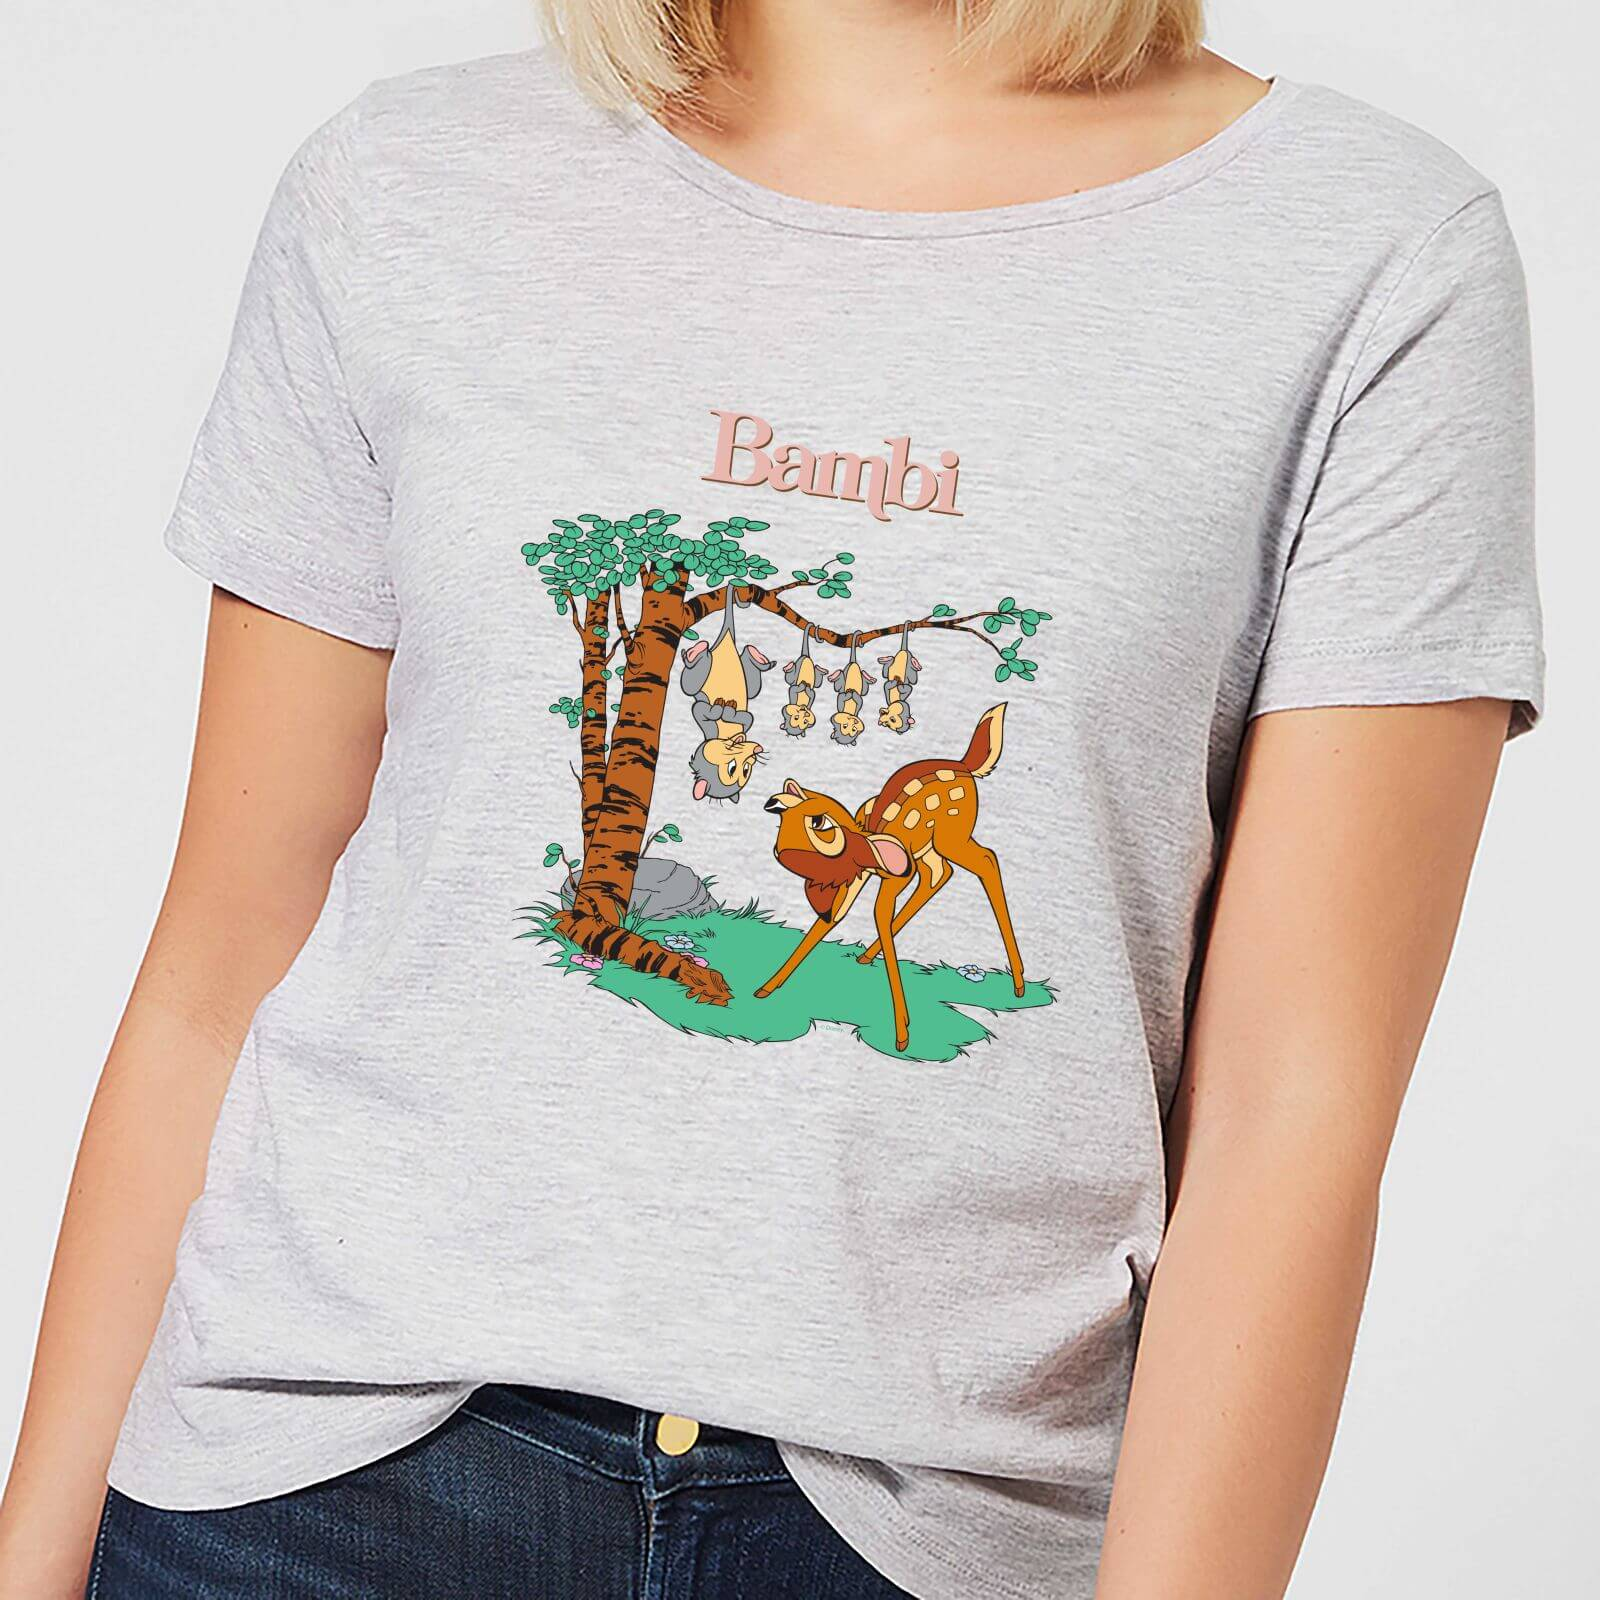 Disney Disney Bambi Tilted Up Women's T-Shirt - Grey - 3XL - Grey